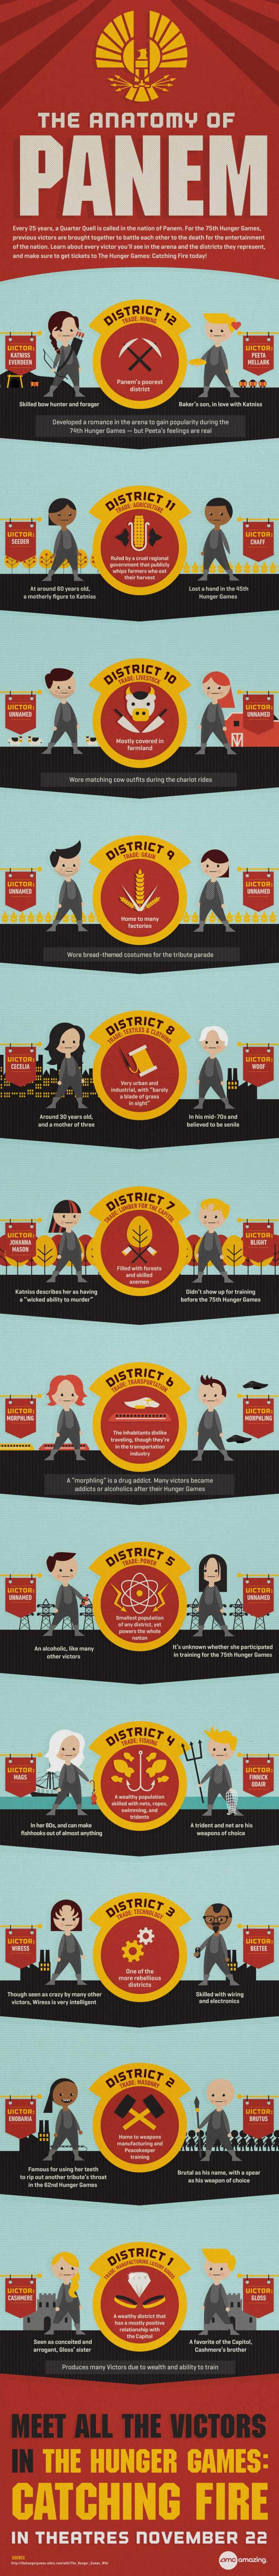 HungerGames_Infographic